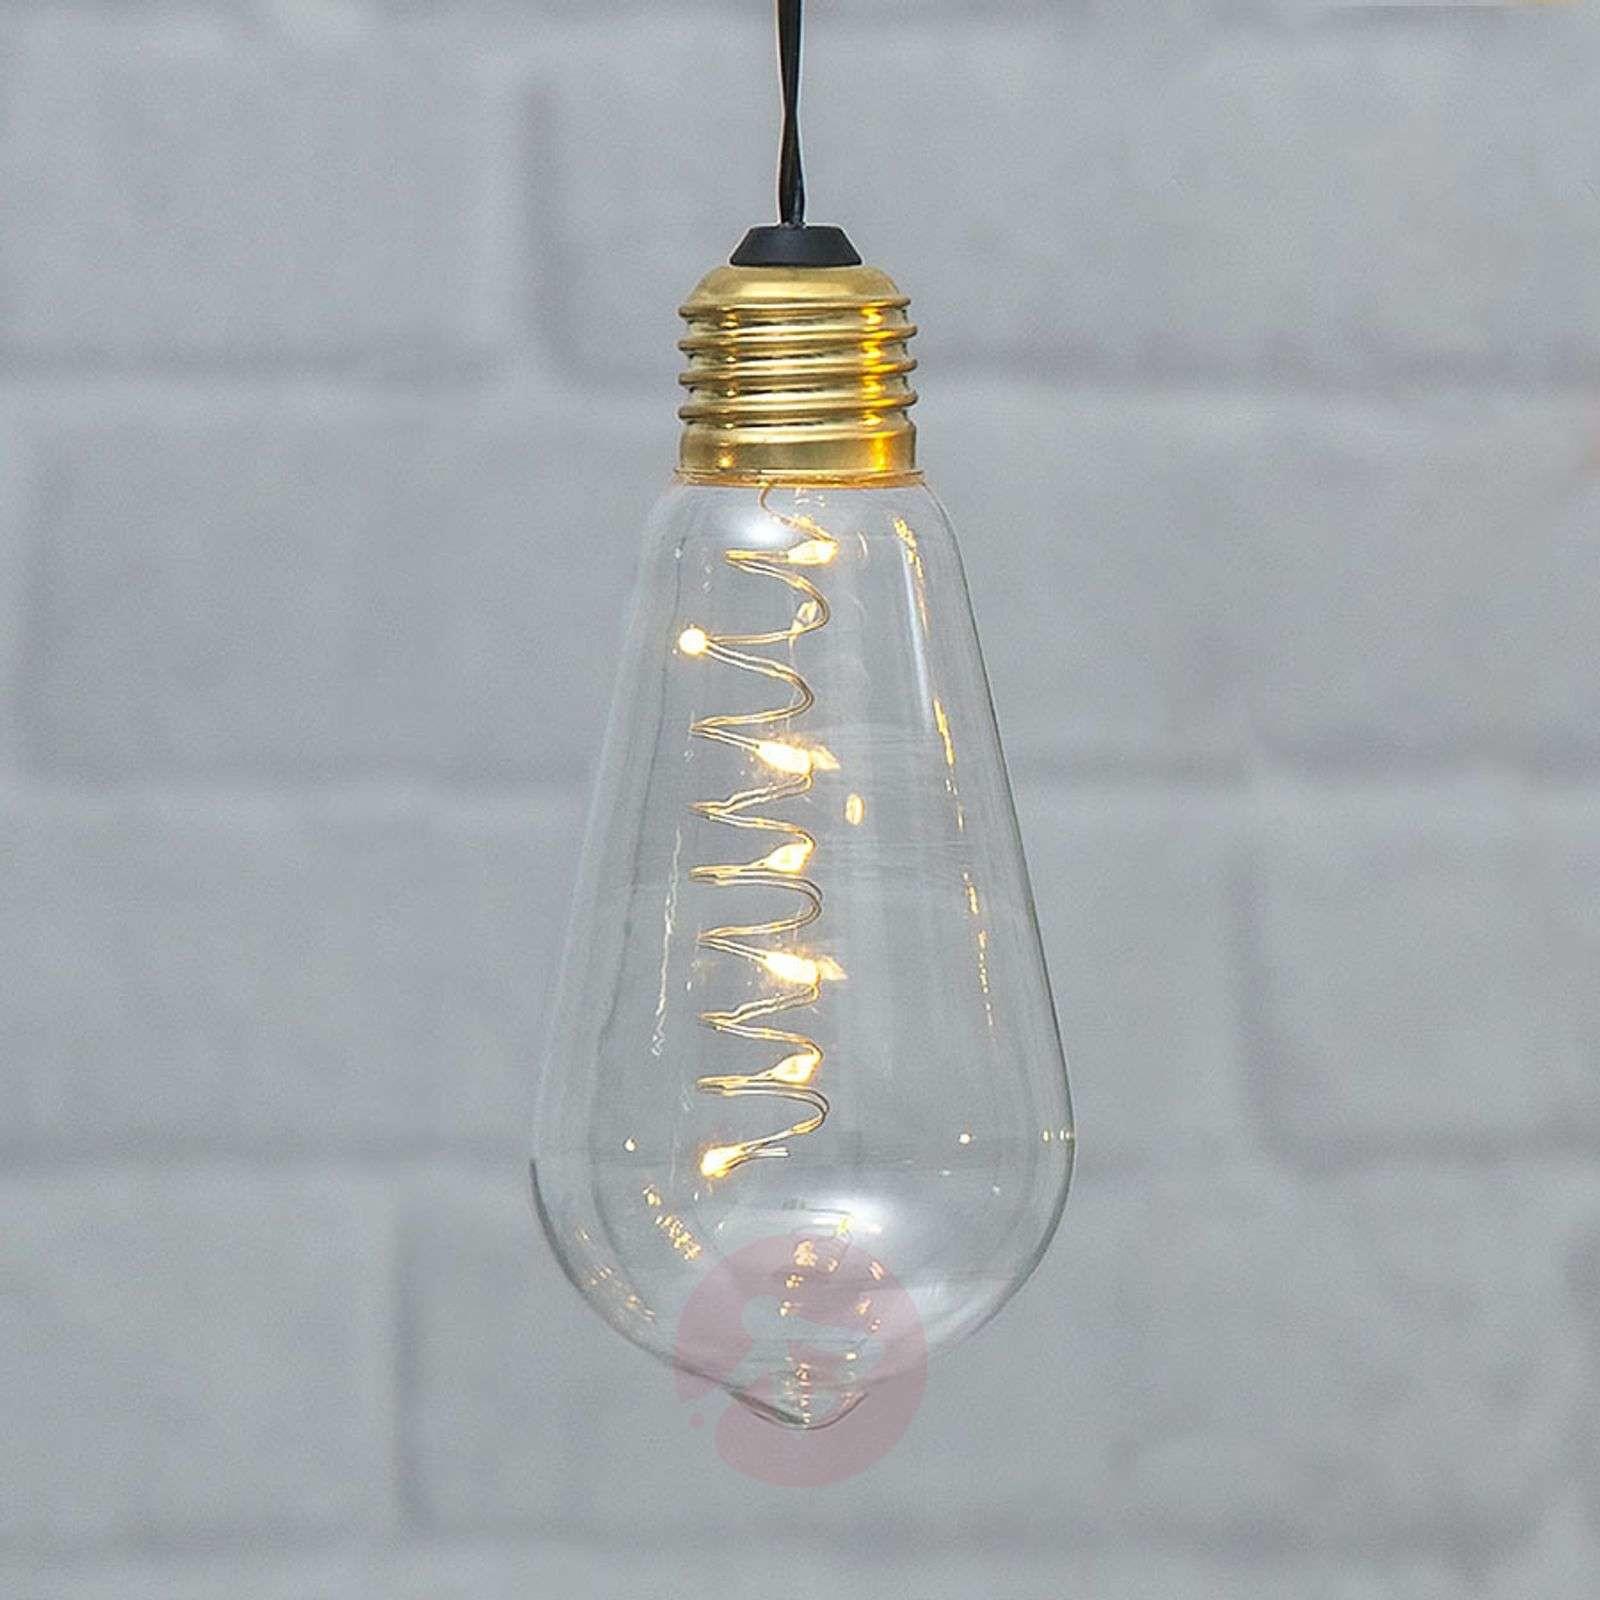 Best Season Vintage-LED-Dekoleuchte Glow mit Timer, klar